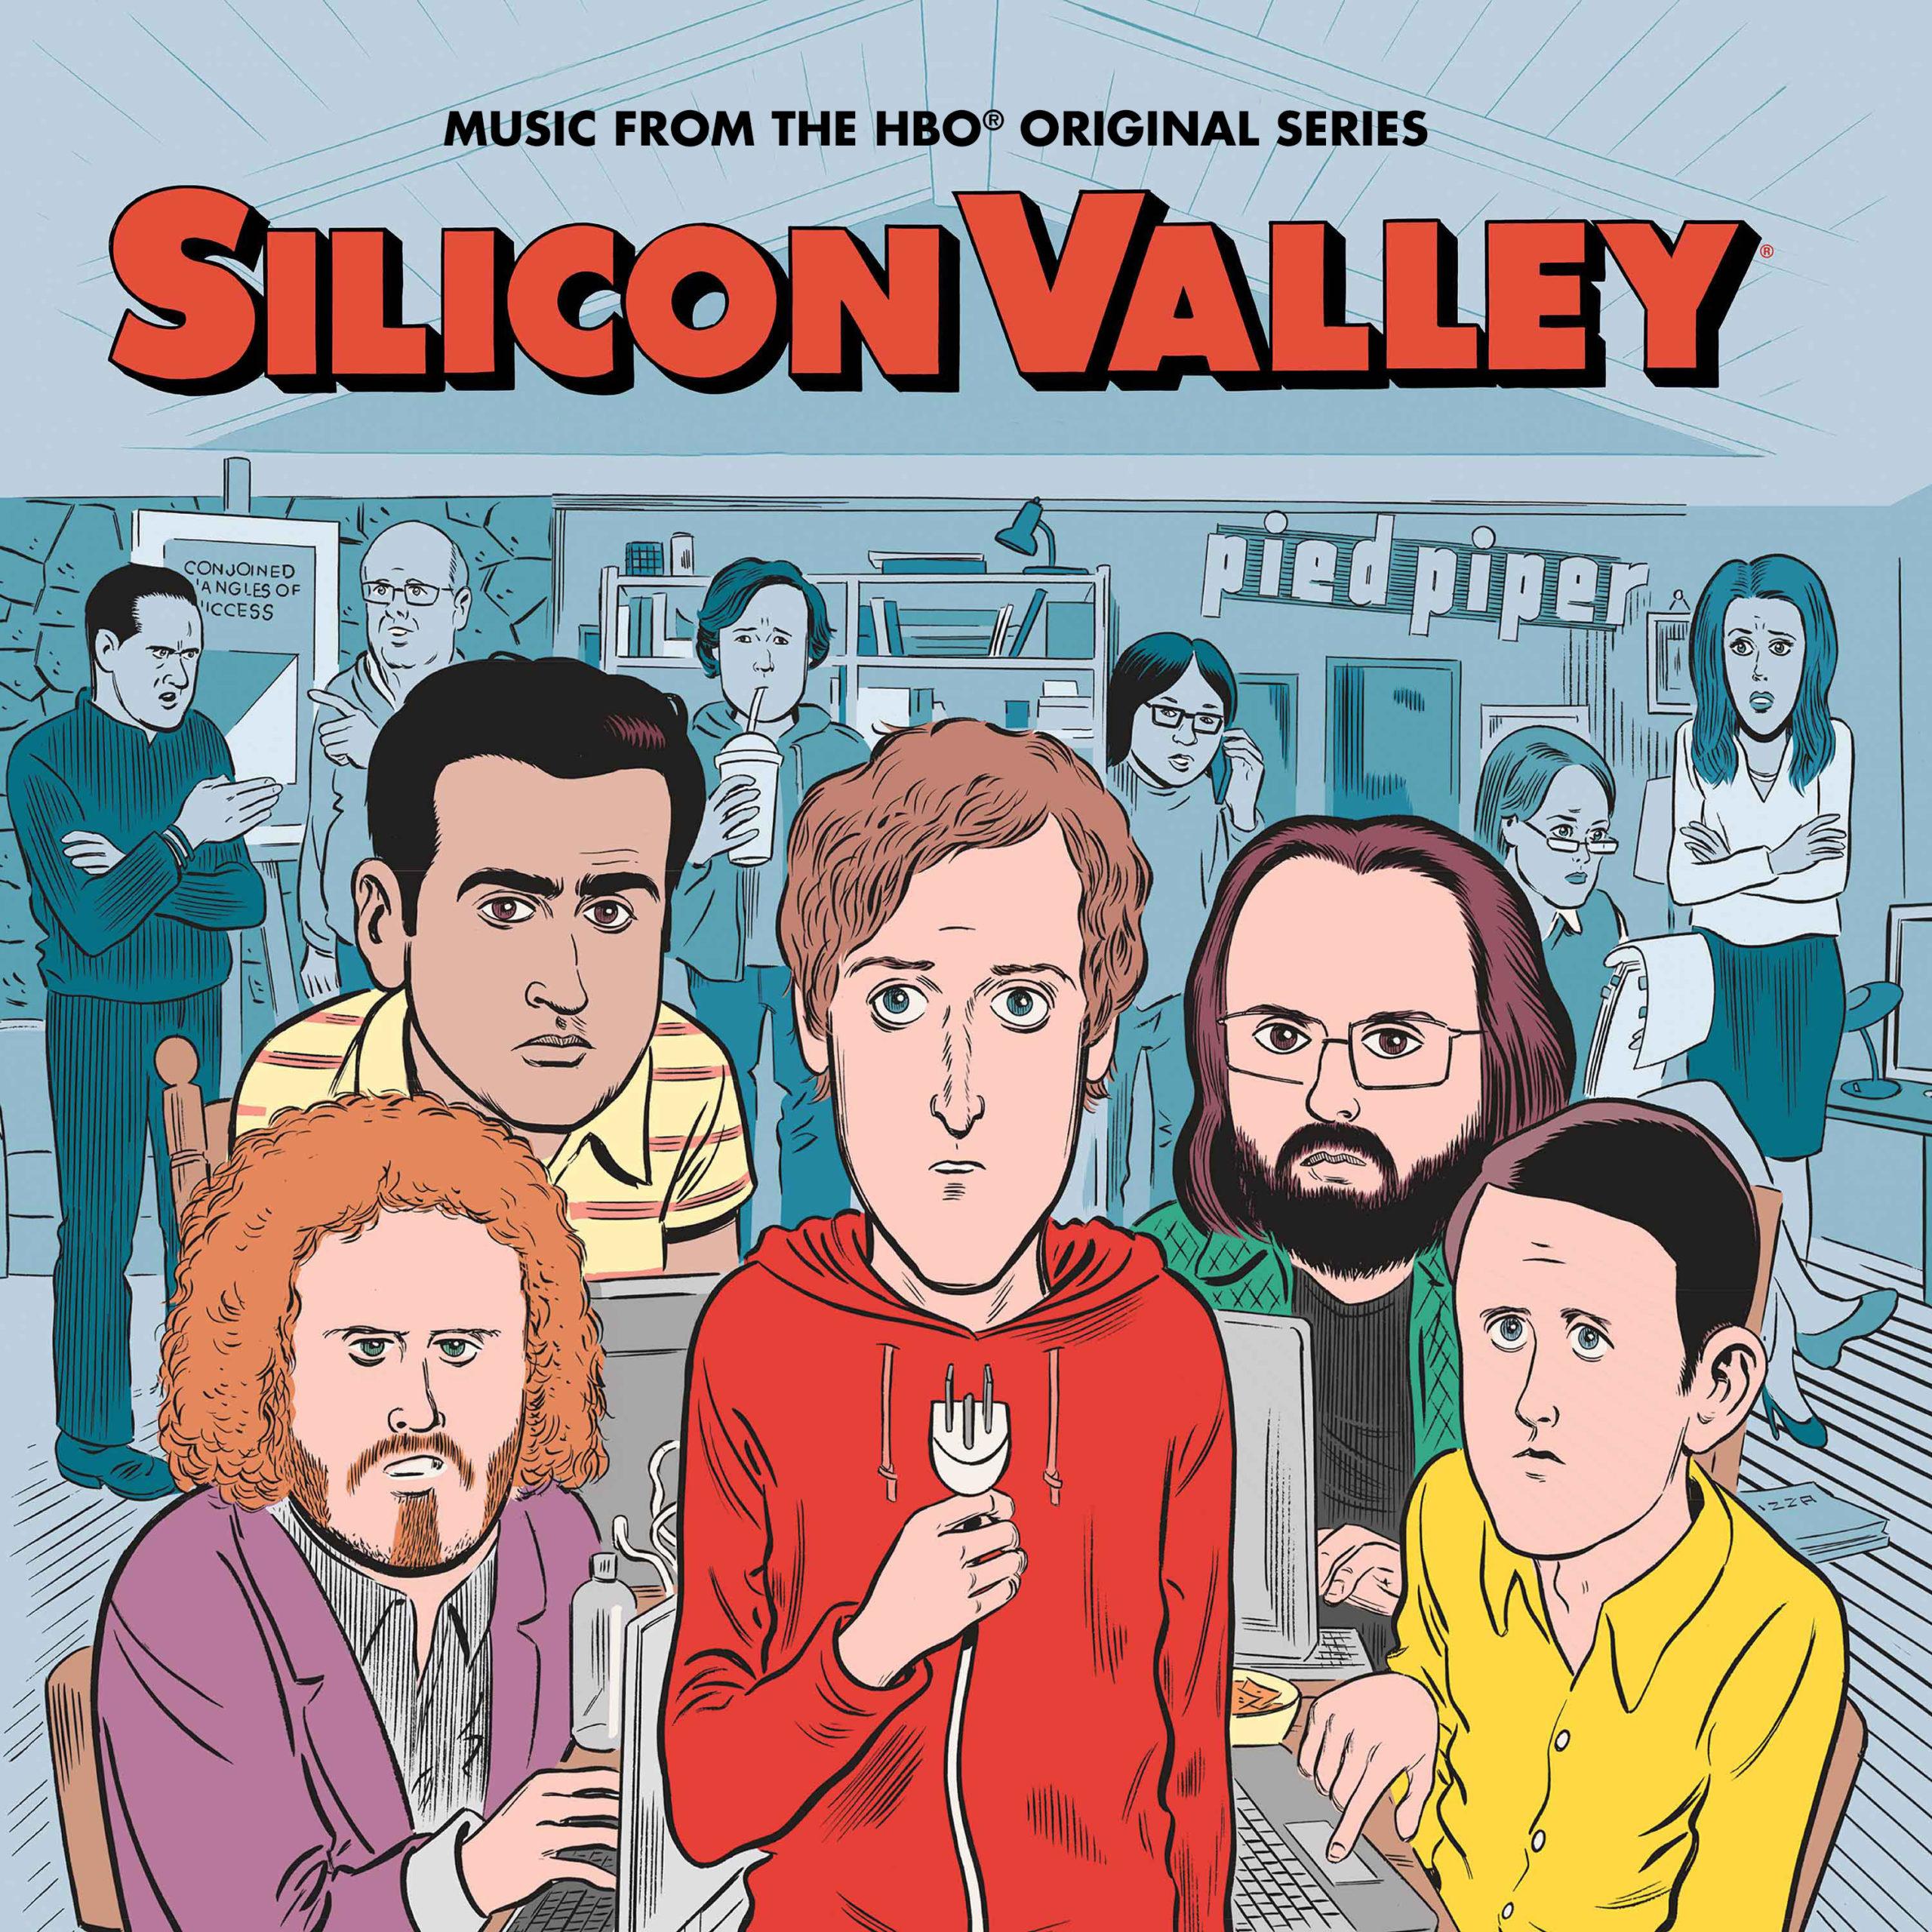 Silicon Valley soundtrack